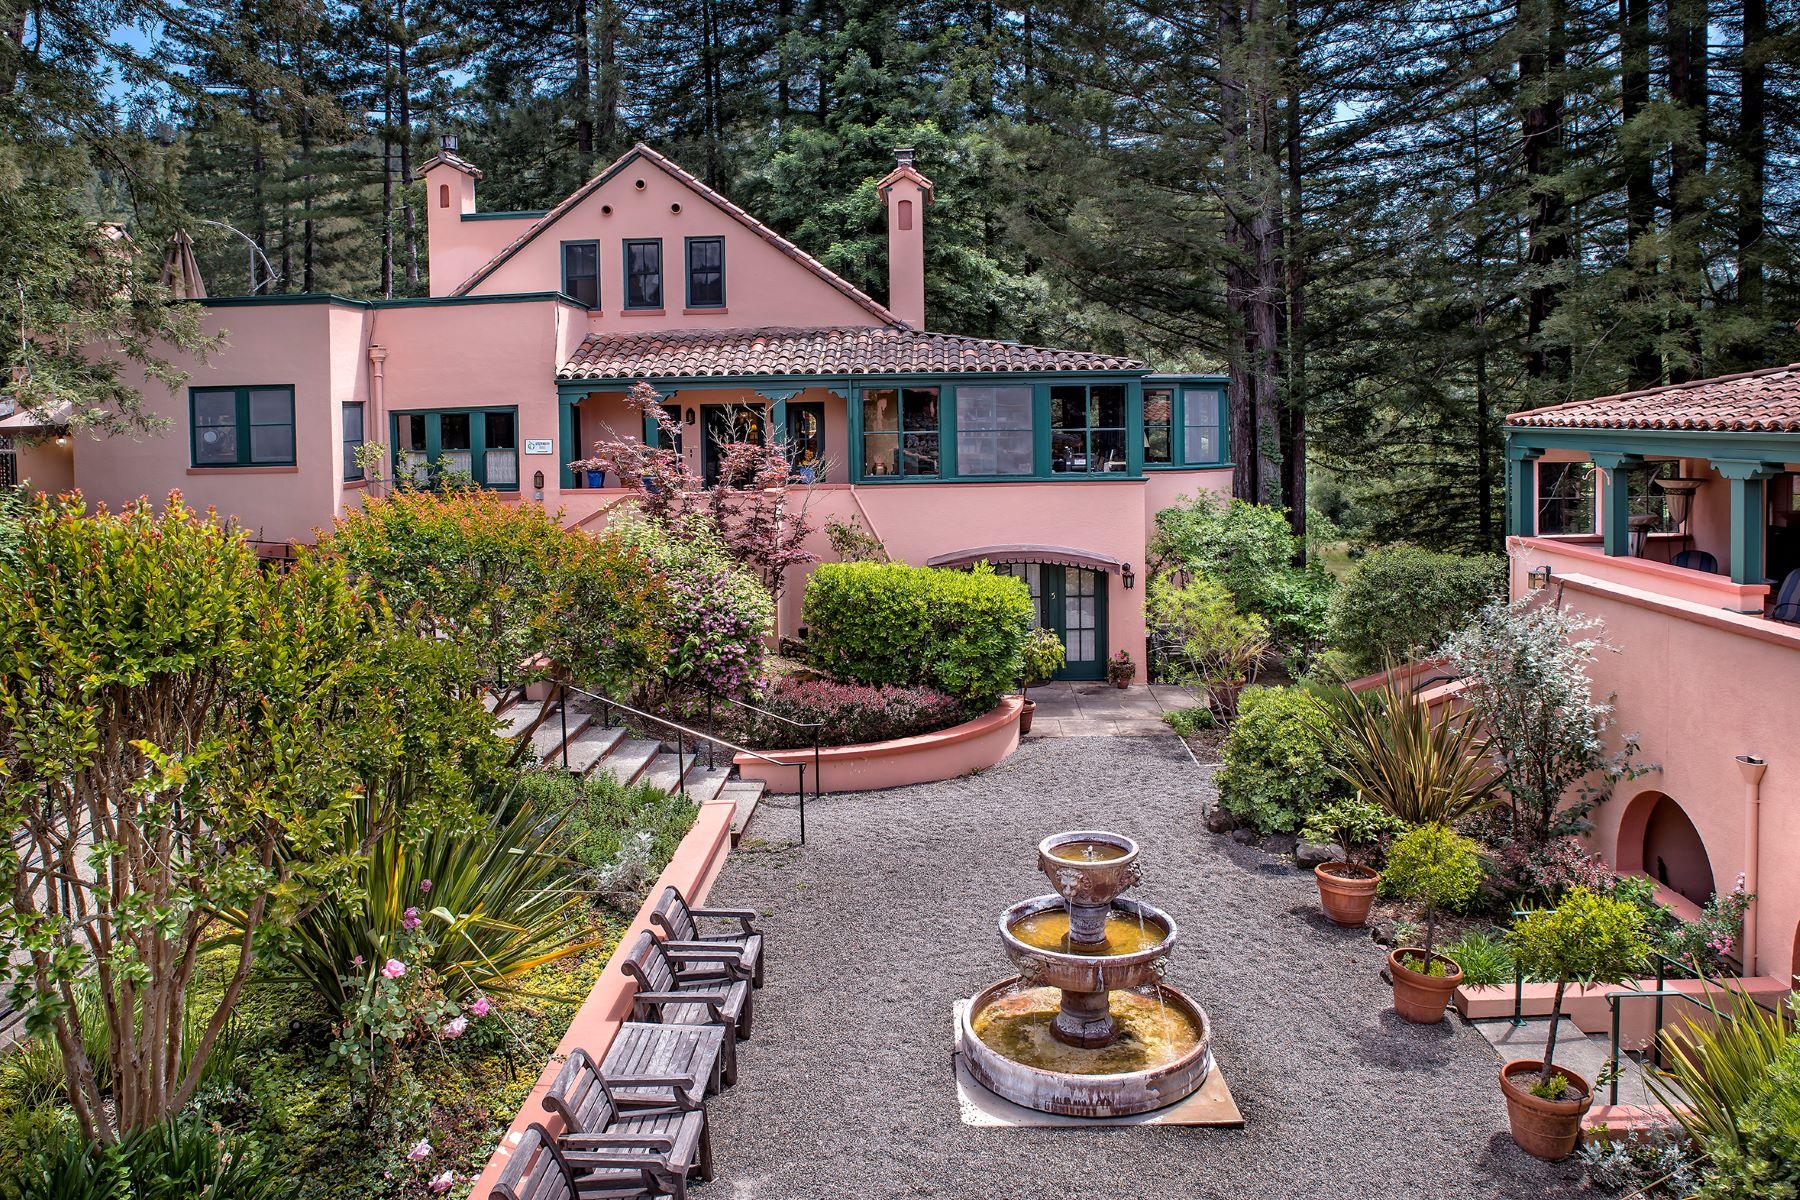 Other Residential Homes 为 销售 在 Applewood Inn 13555 Highway 116 盖尔南维尔, 加利福尼亚州 95446 美国